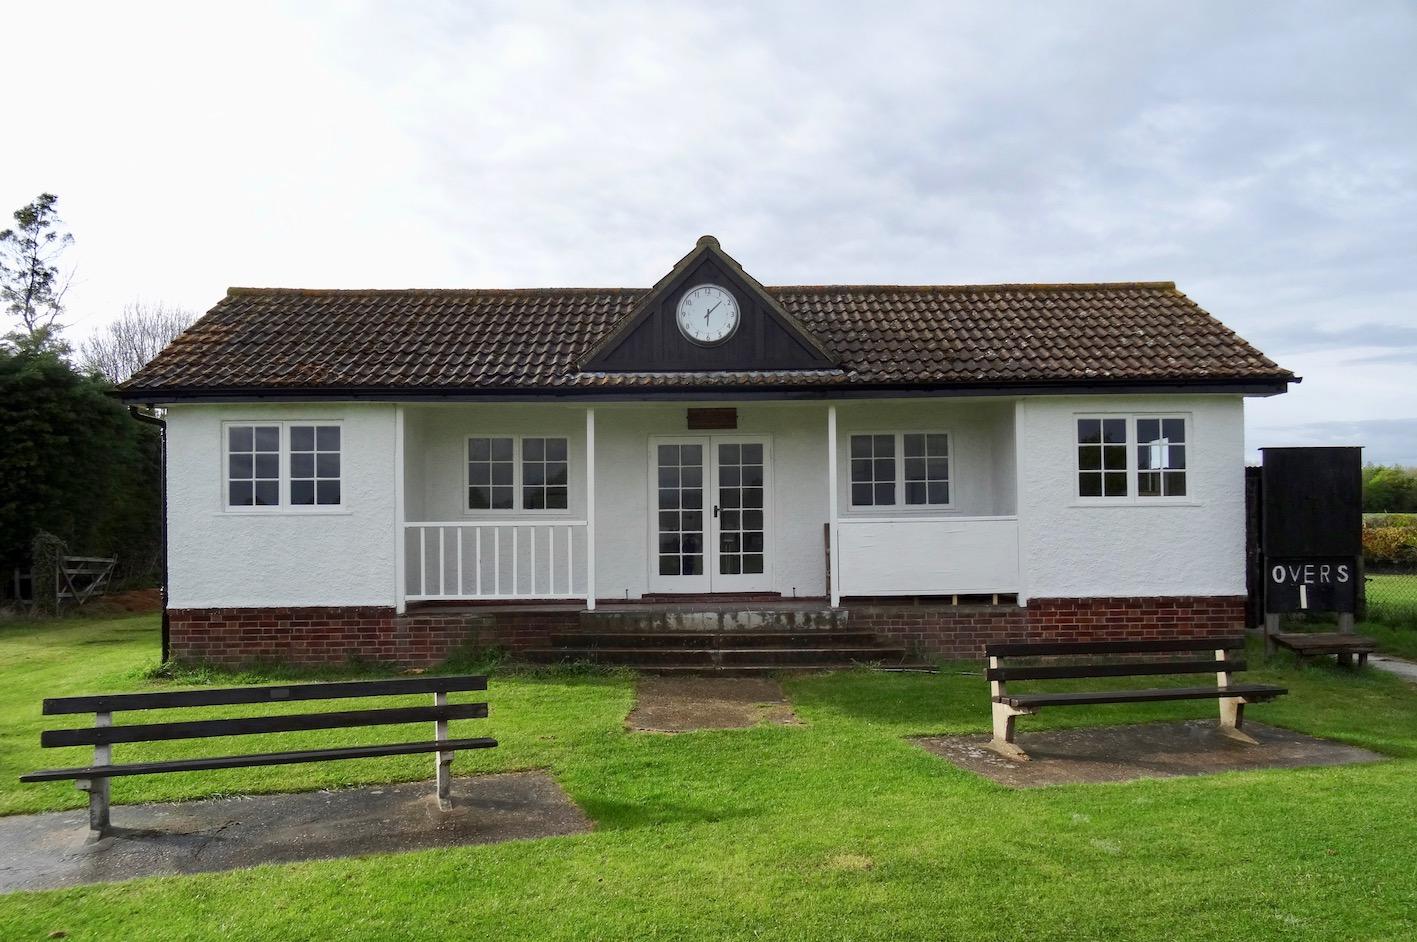 The George Miller Pavilion at Barrington Cricket Club Cambridgeshire.